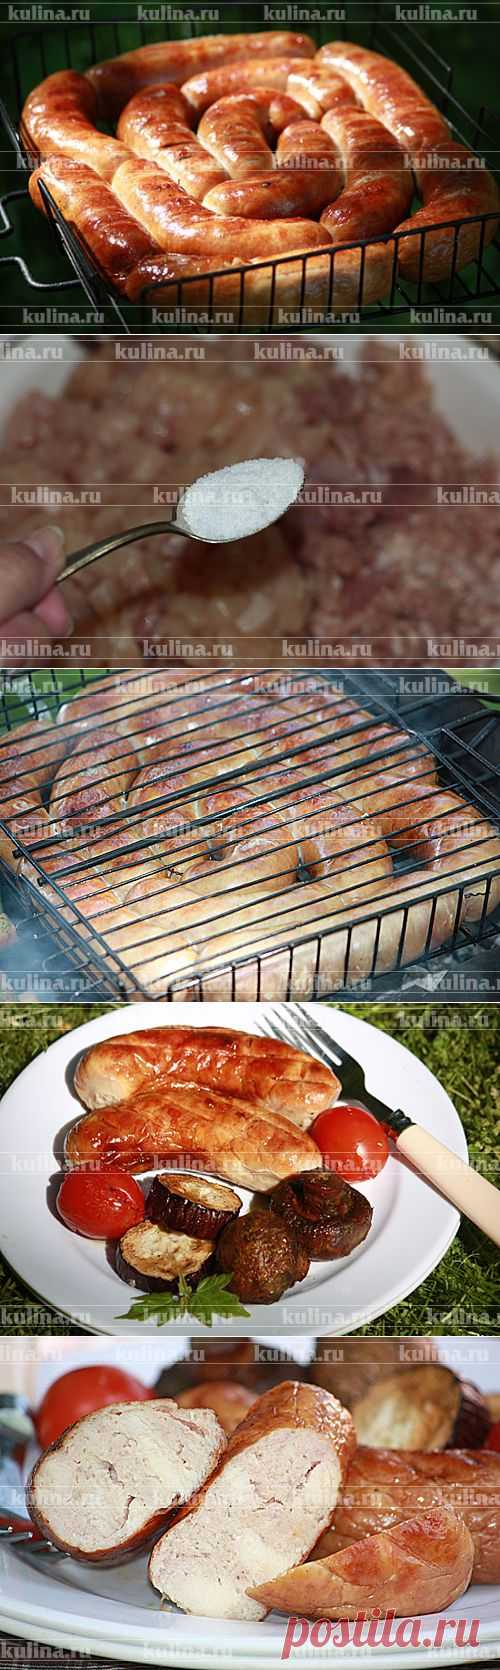 Колбаски куриные с кардамоном – рецепт приготовления с фото от Kulina.Ru